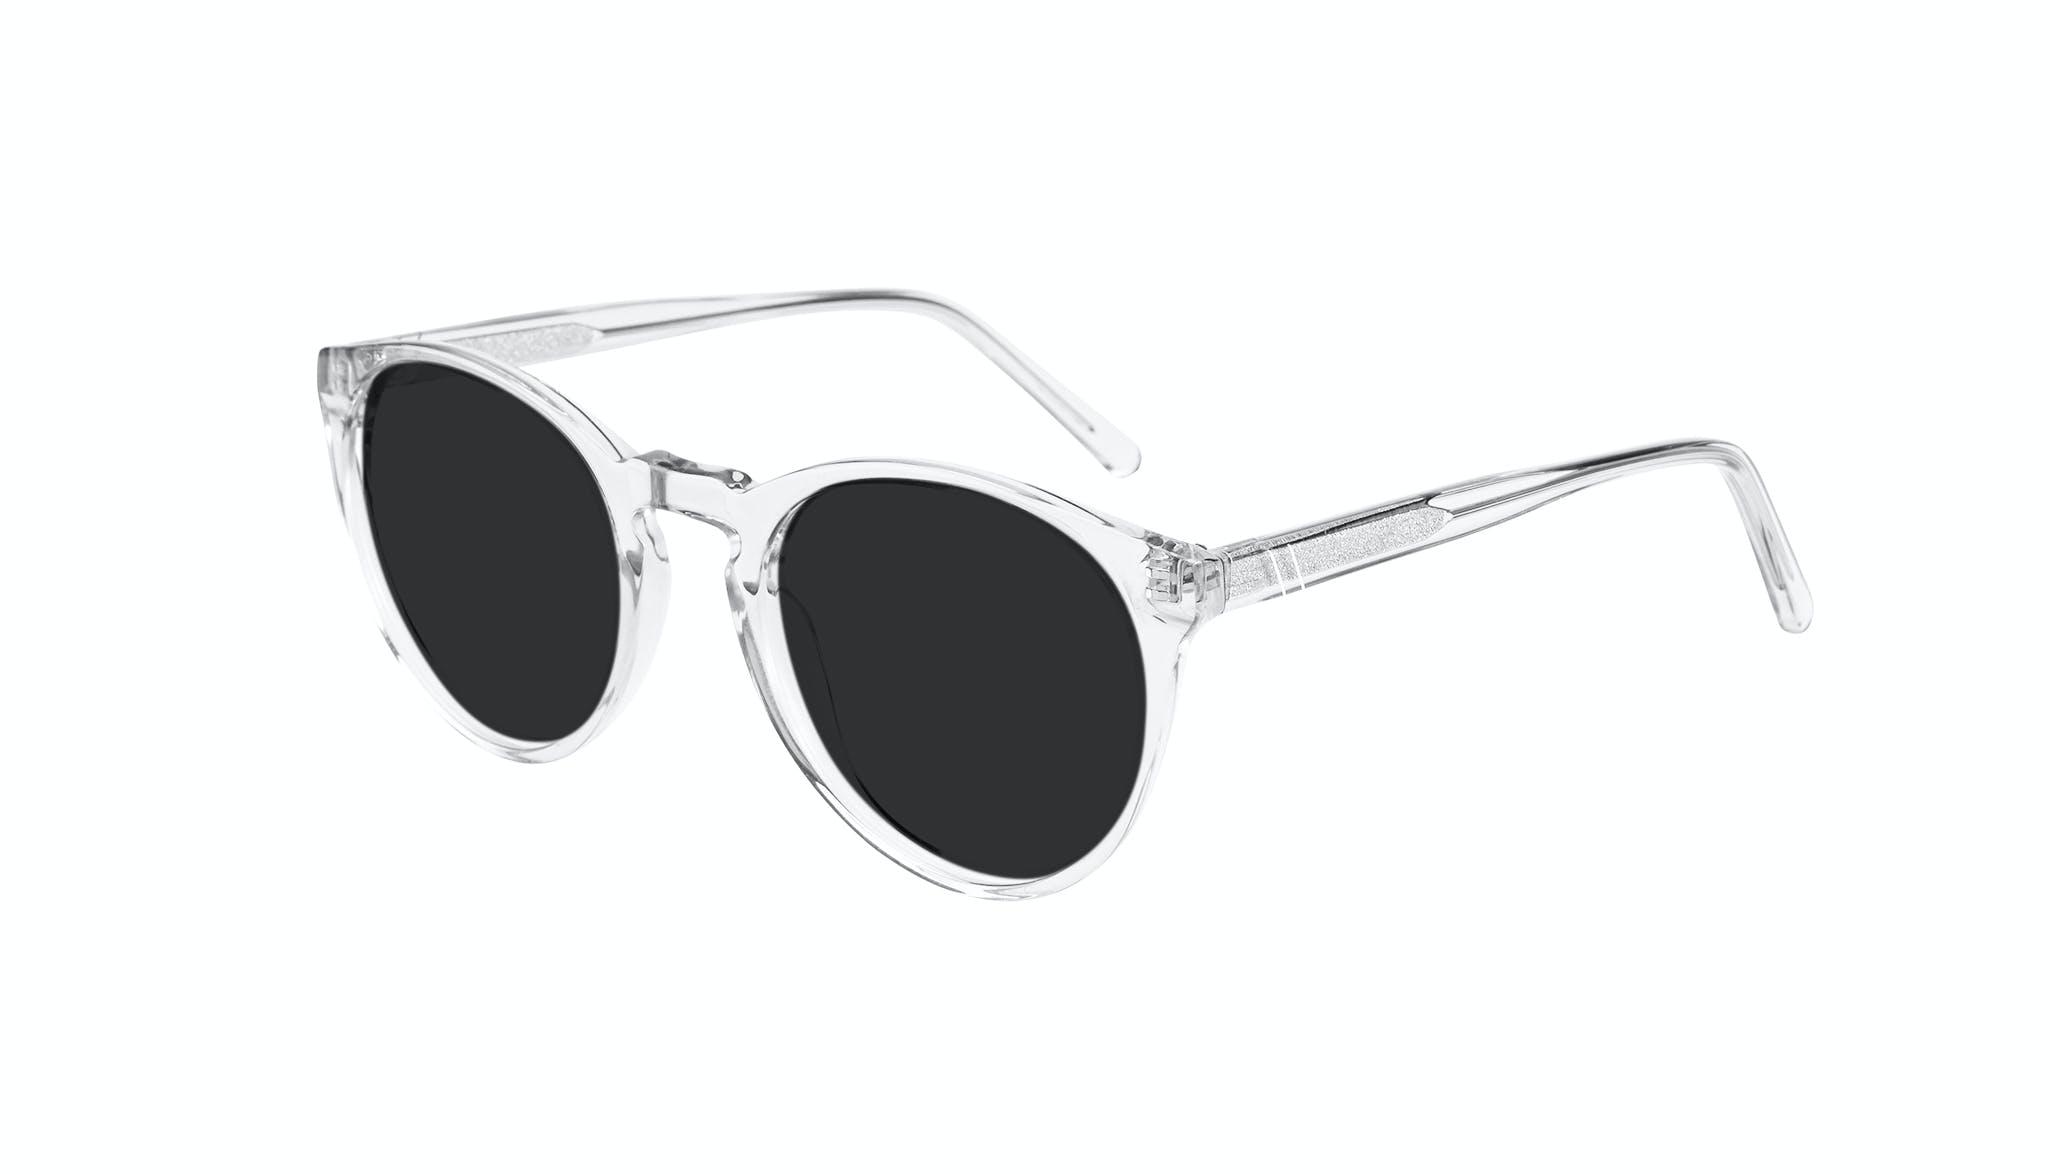 Affordable Fashion Glasses Round Sunglasses Men Arch Grey Tilt